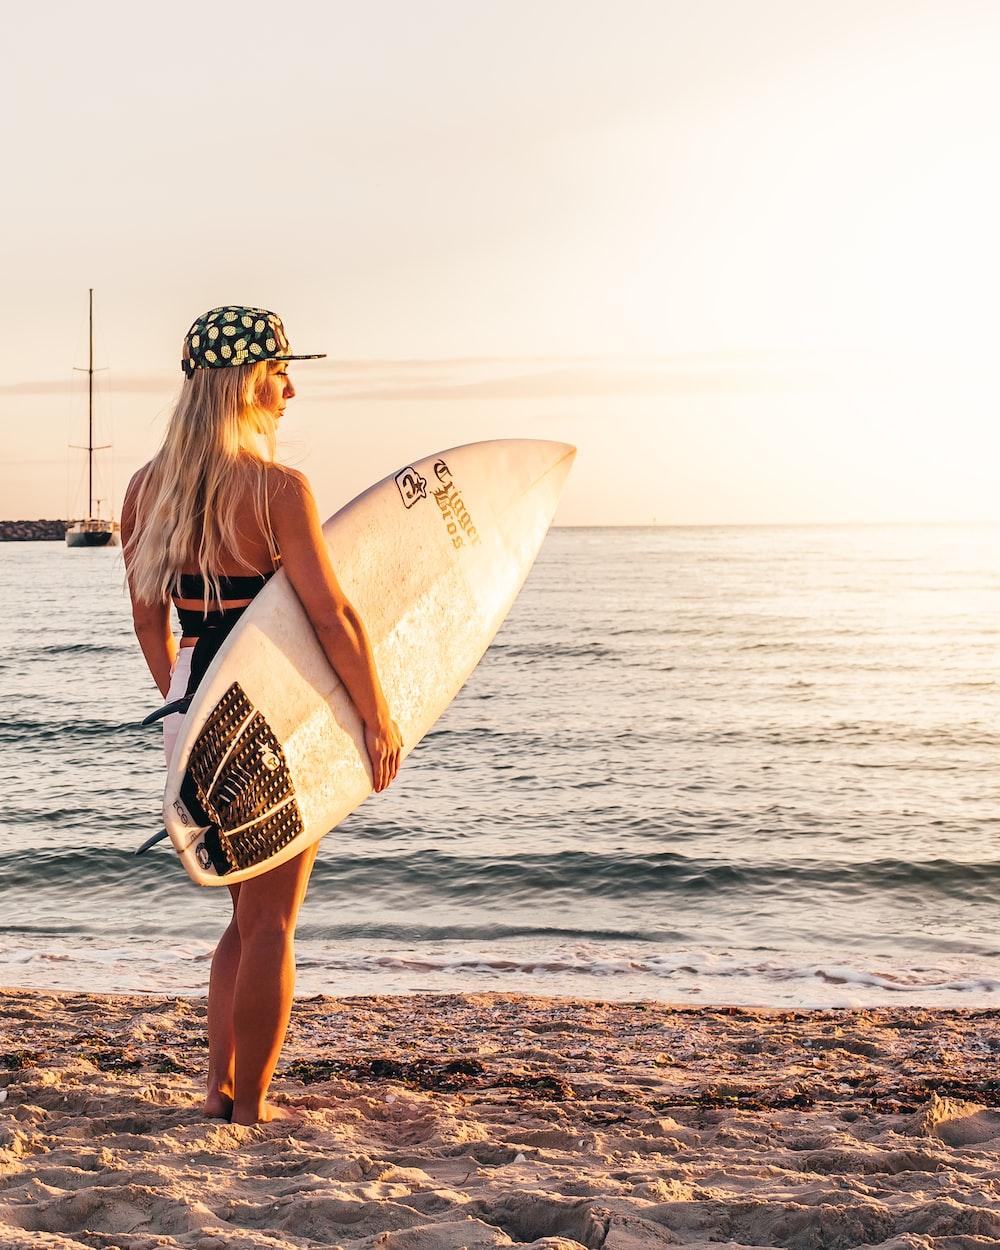 woman in black bikini holding surfboard standing on beach during daytime